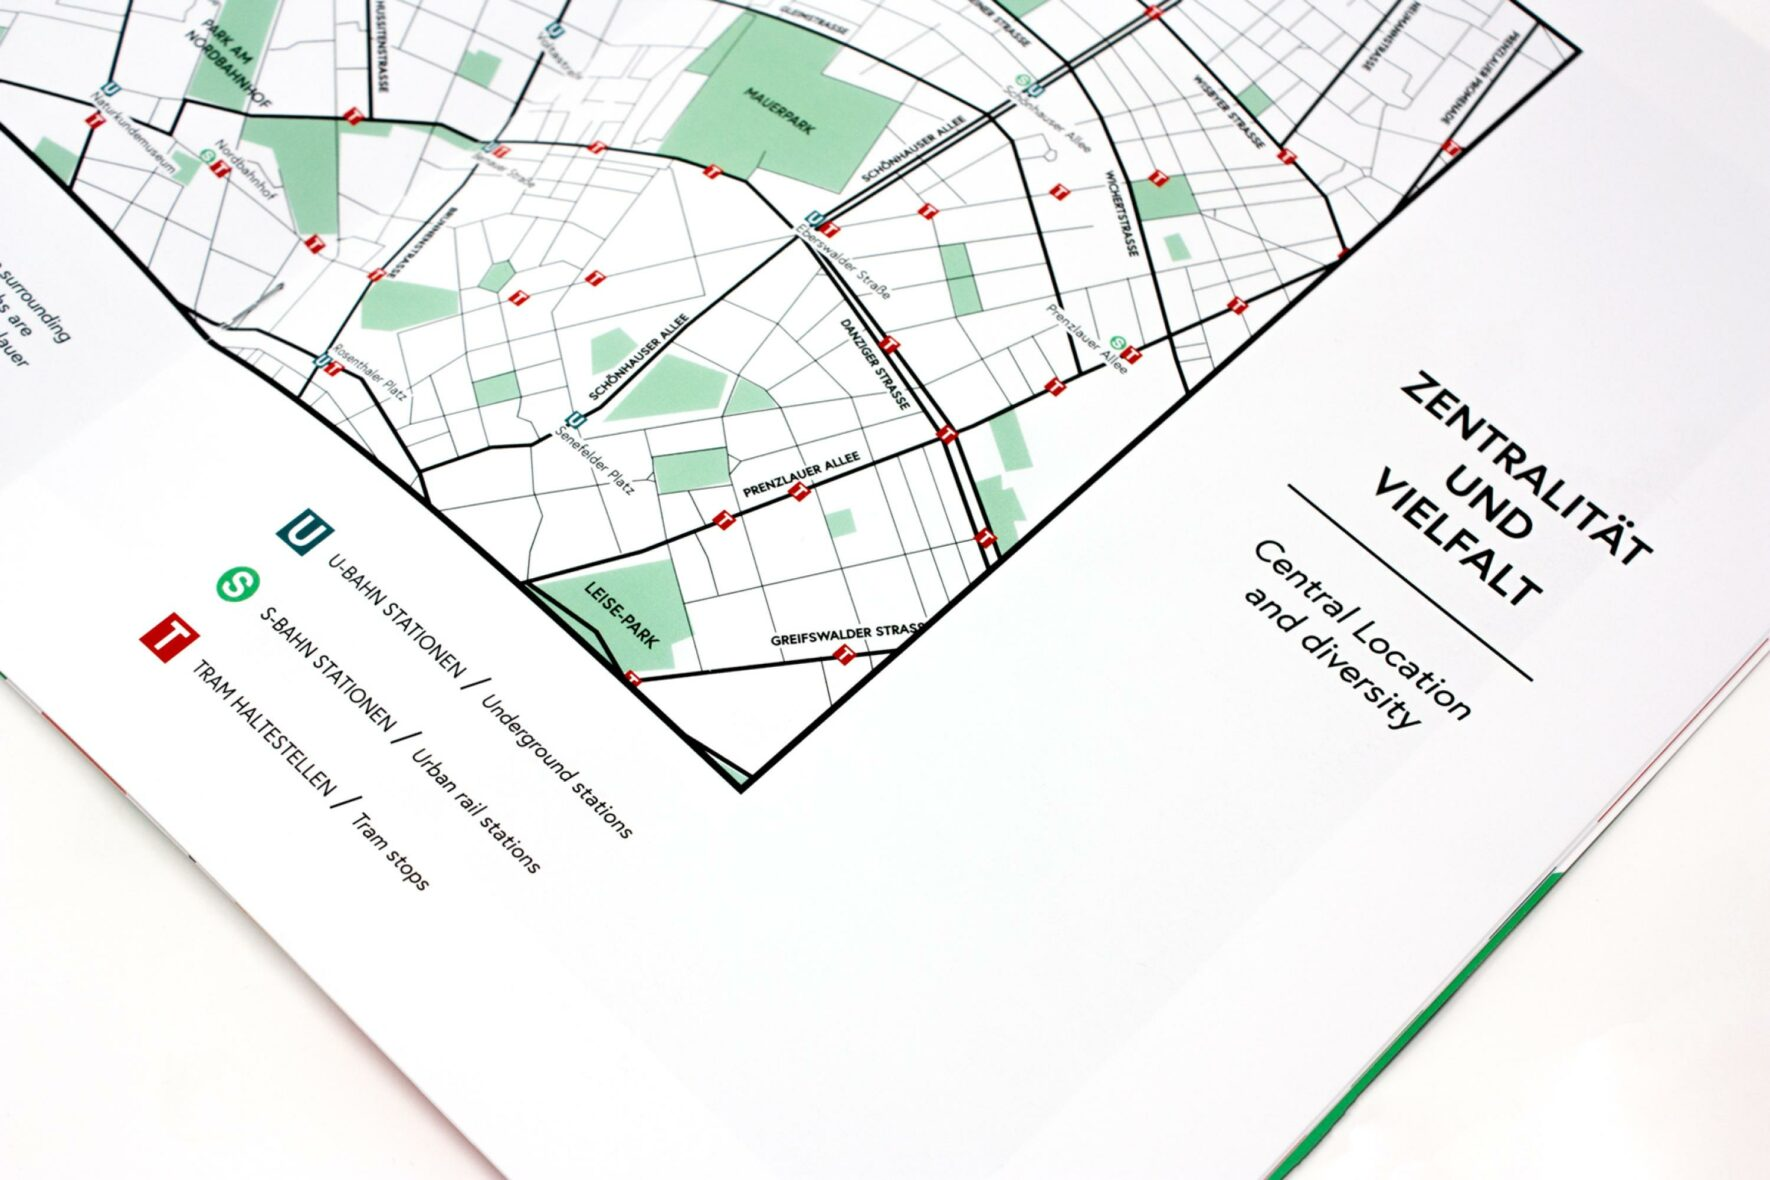 Broschuere-Osloer-Immobilienbranding-Trendcity-FORMLOS-berlin-12